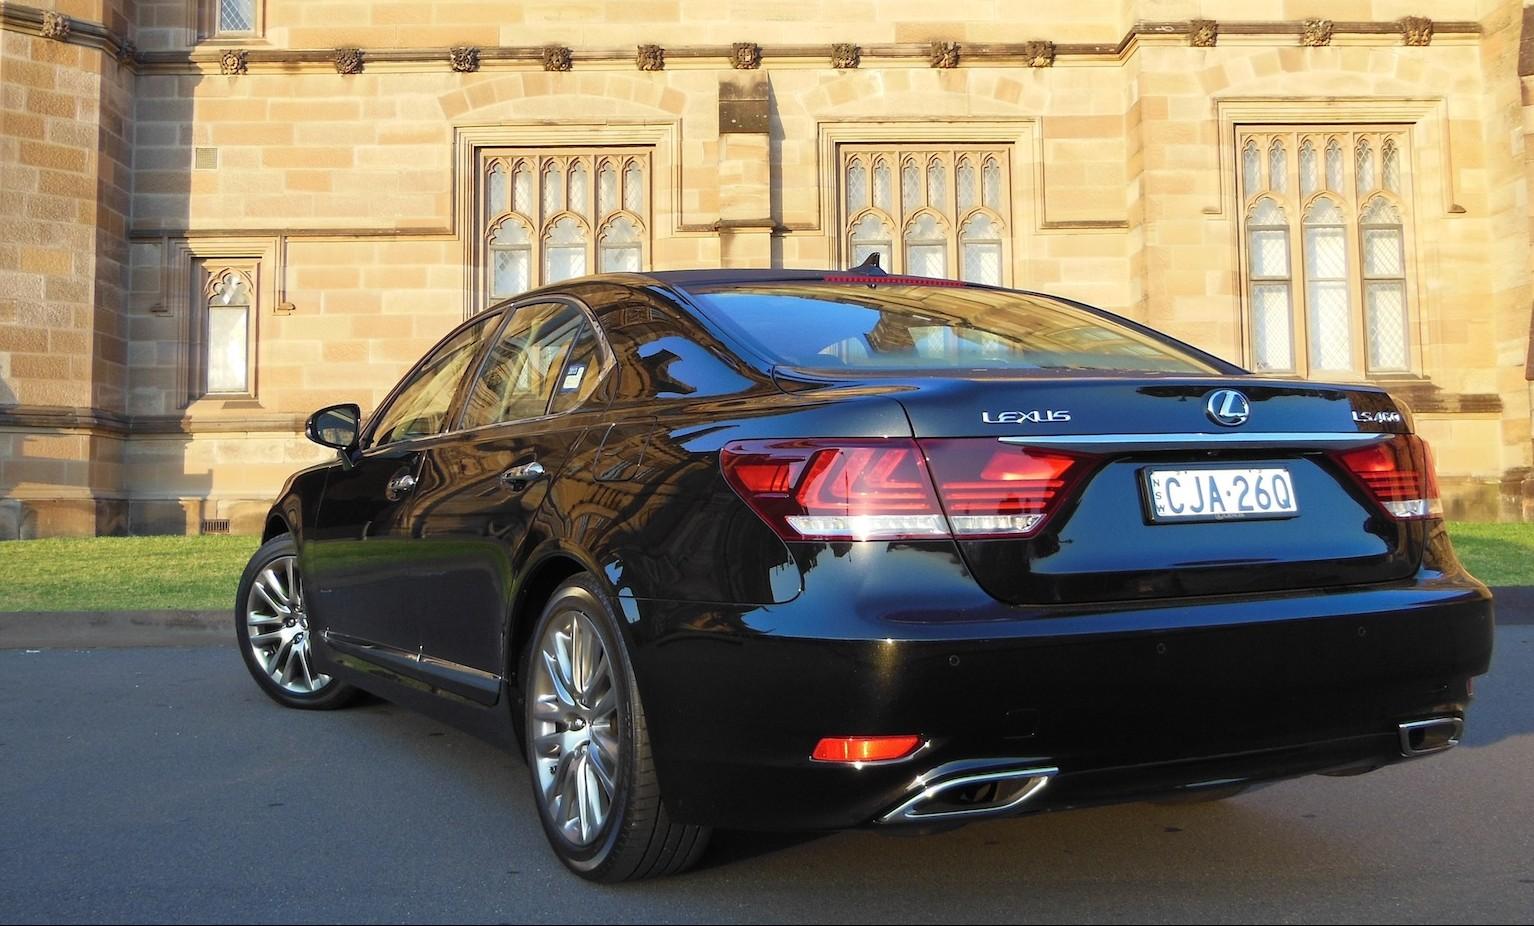 2013 lexus ls 460 f sport test drive luxury car video autos weblog. Black Bedroom Furniture Sets. Home Design Ideas